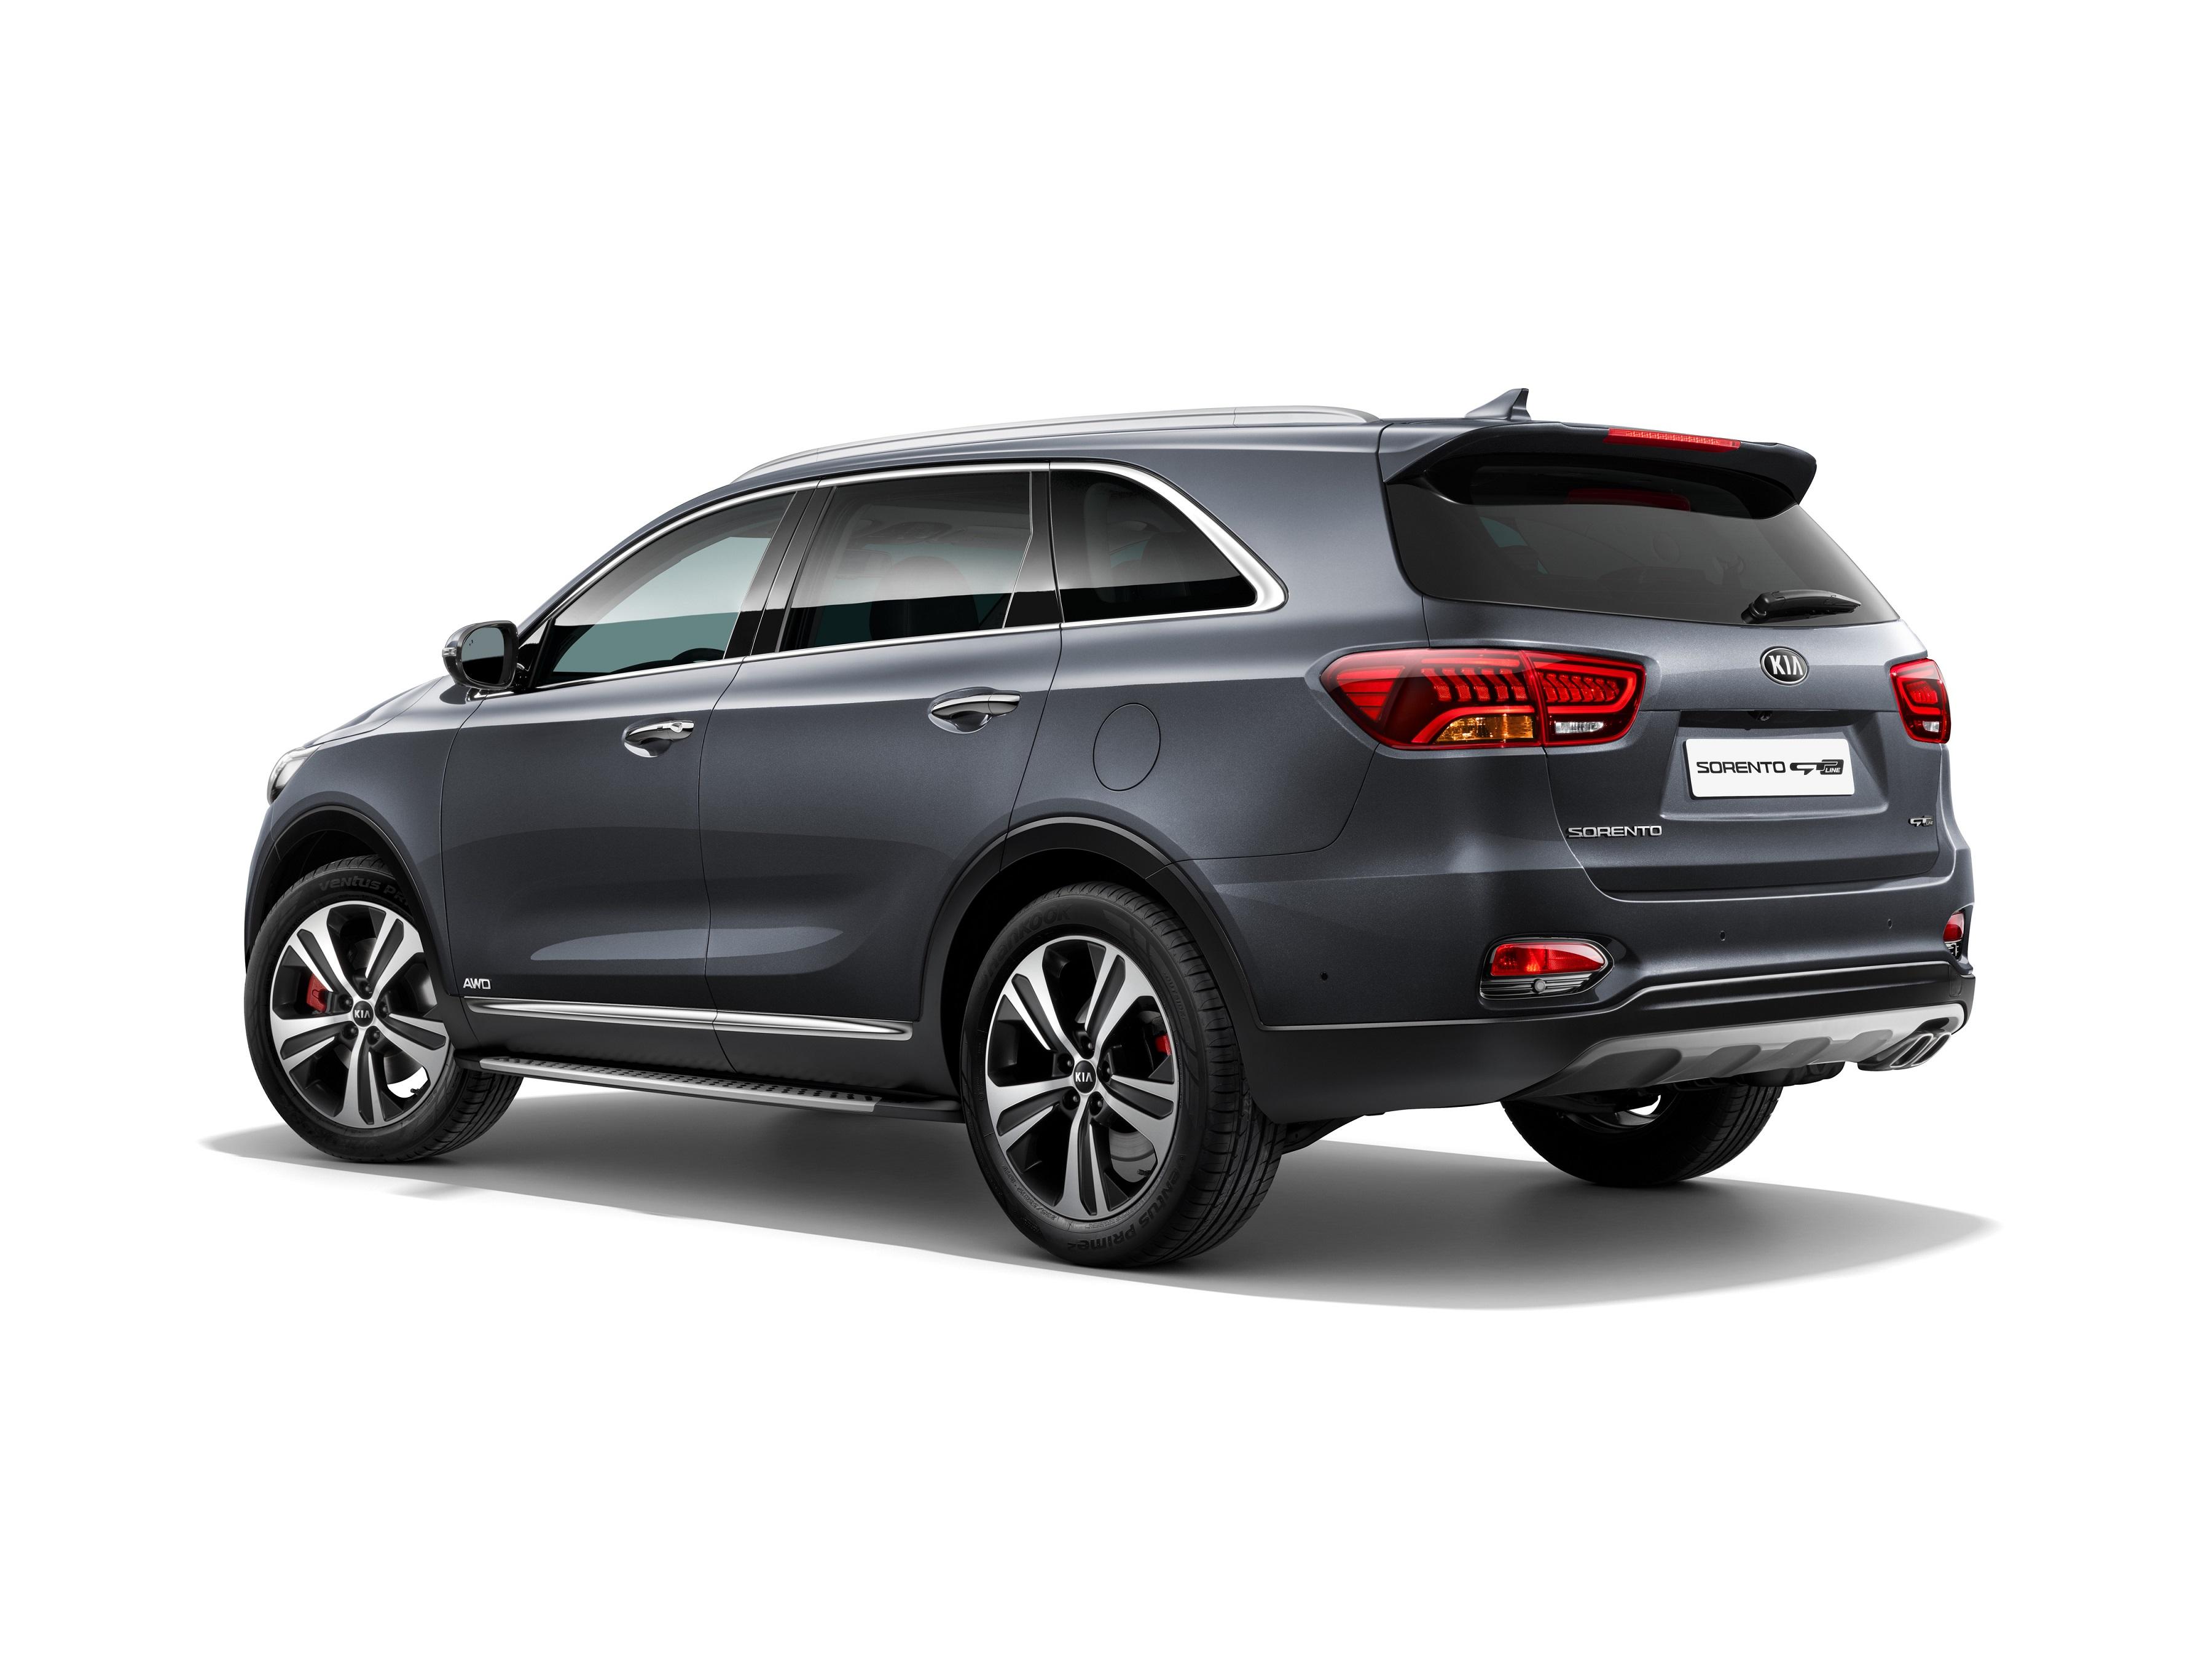 New design and in car technologies for new Kia Sorento